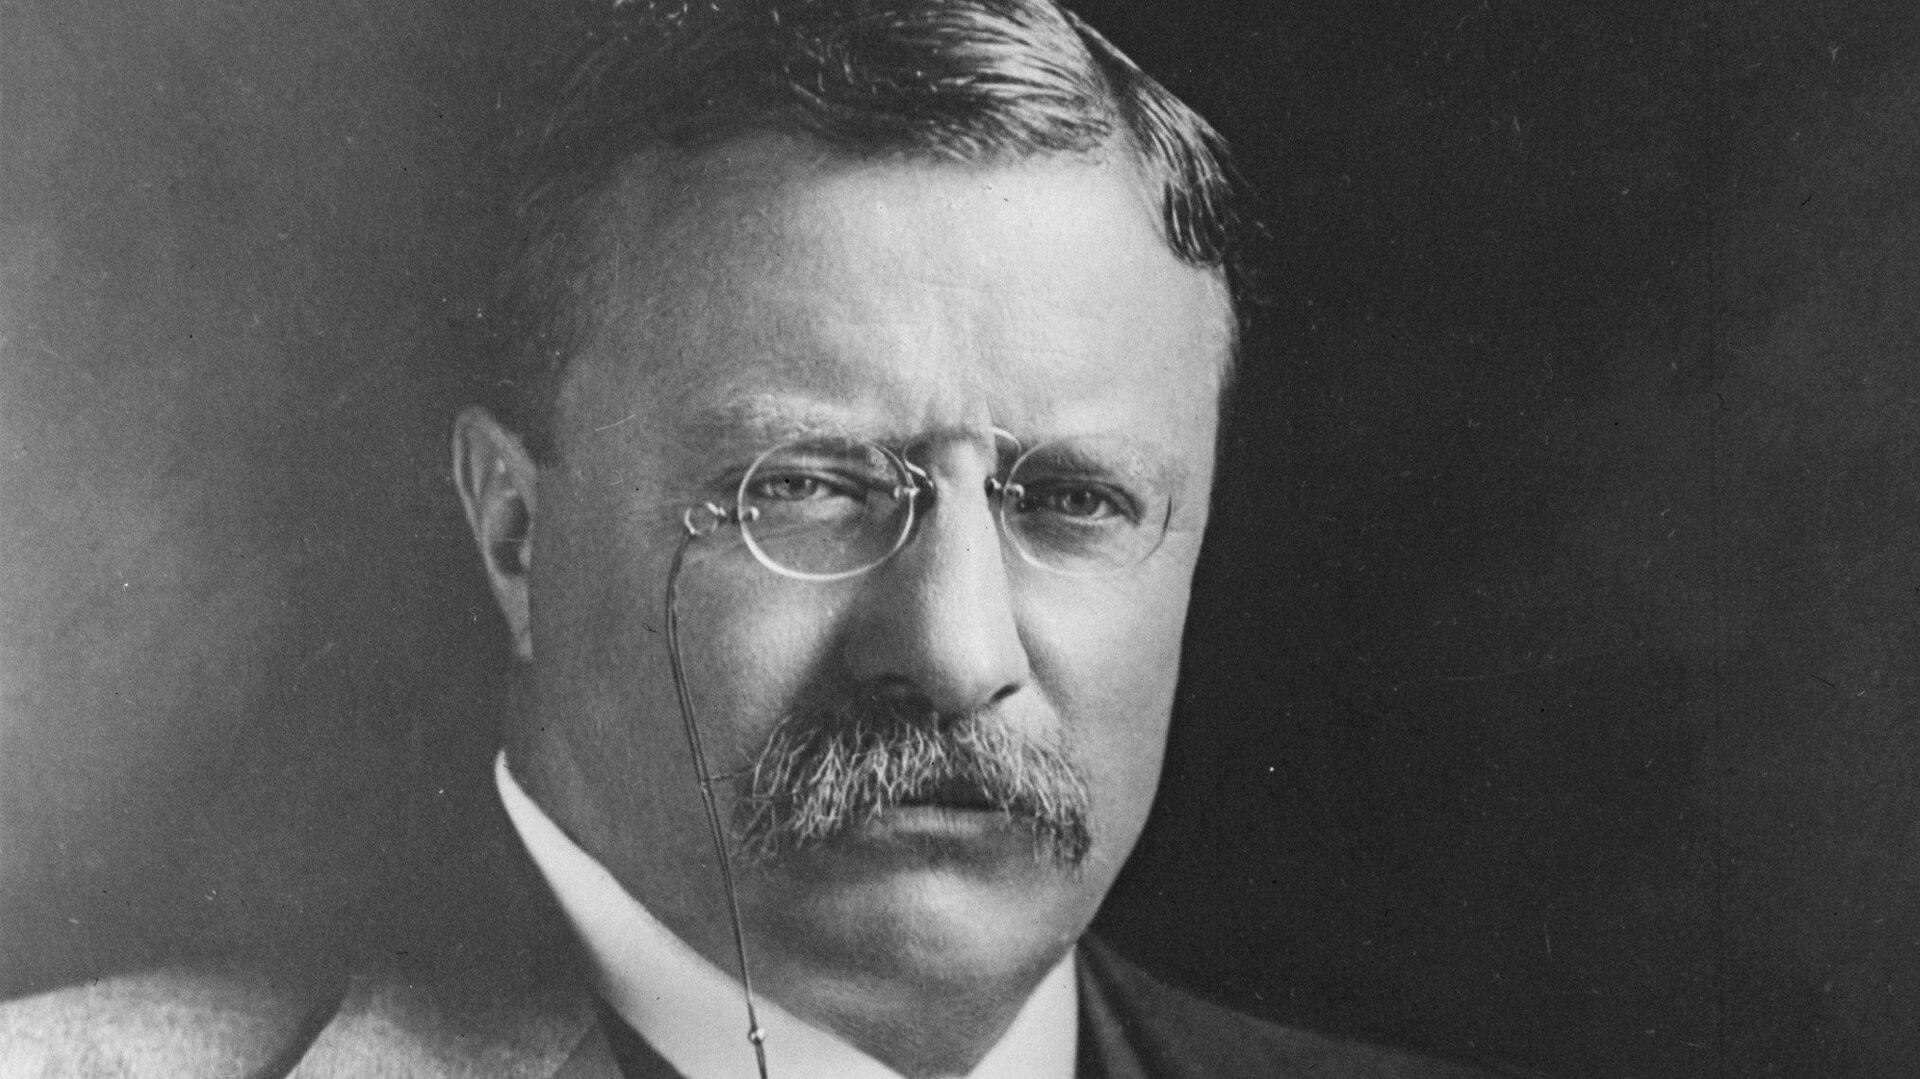 26-й президент США Теодор Рузвельт - РИА Новости, 1920, 14.10.2020